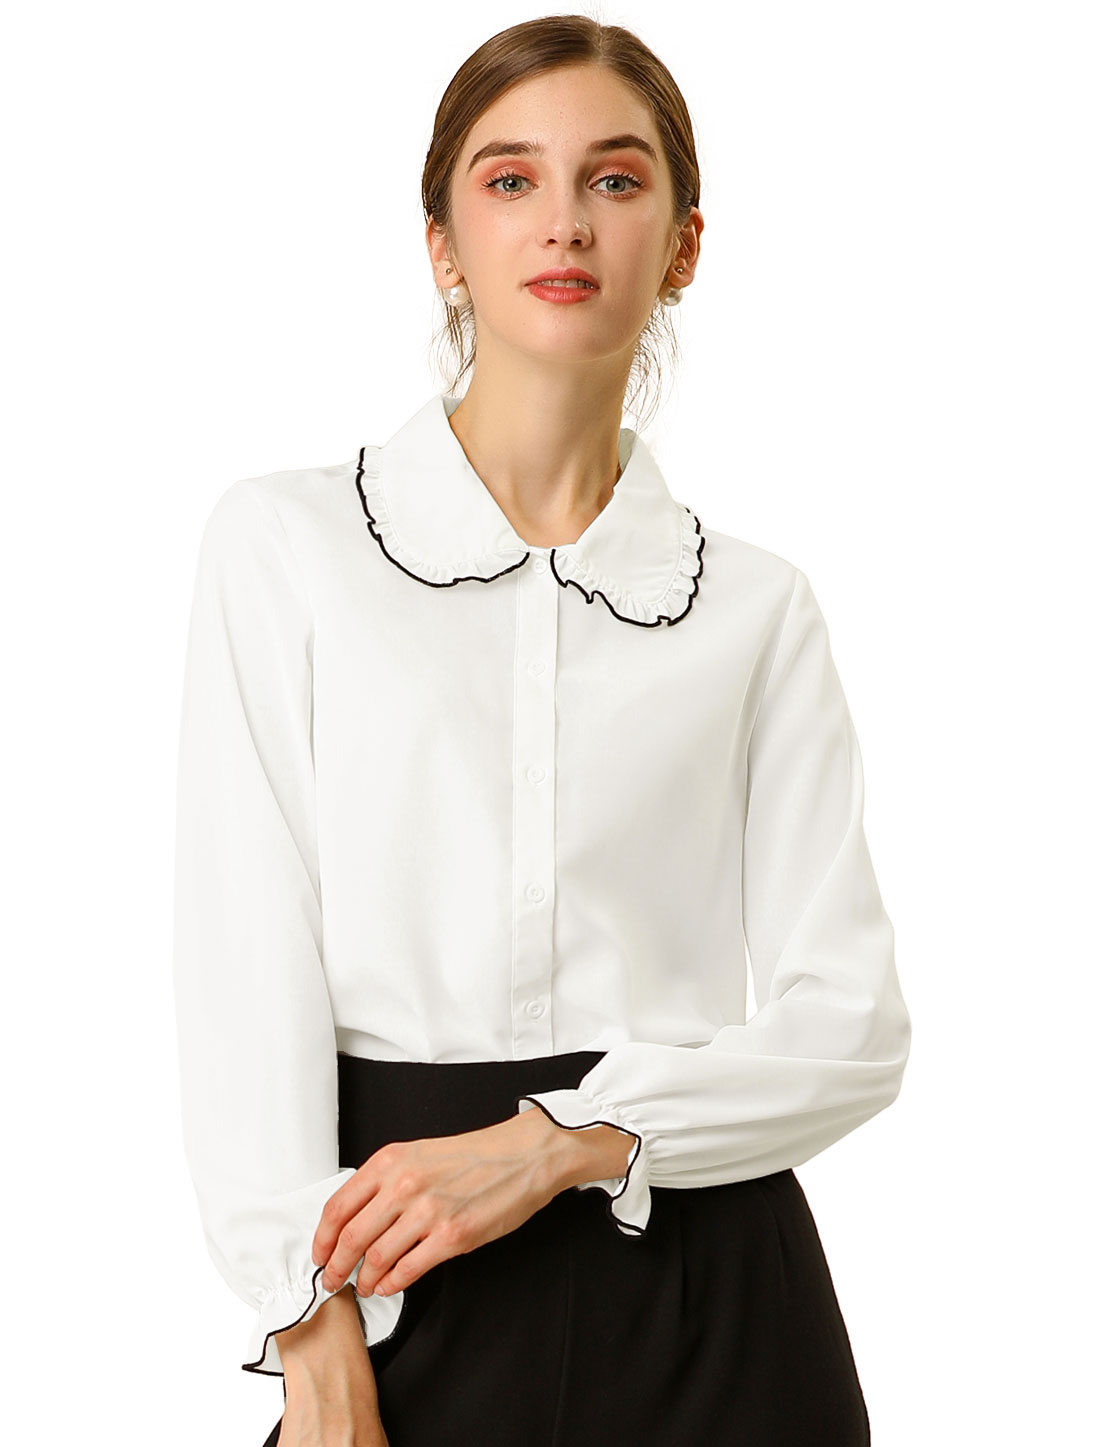 Women's Sweet Ruffle Peter Pan Collar Long Sleeves Button Up Shirt White M